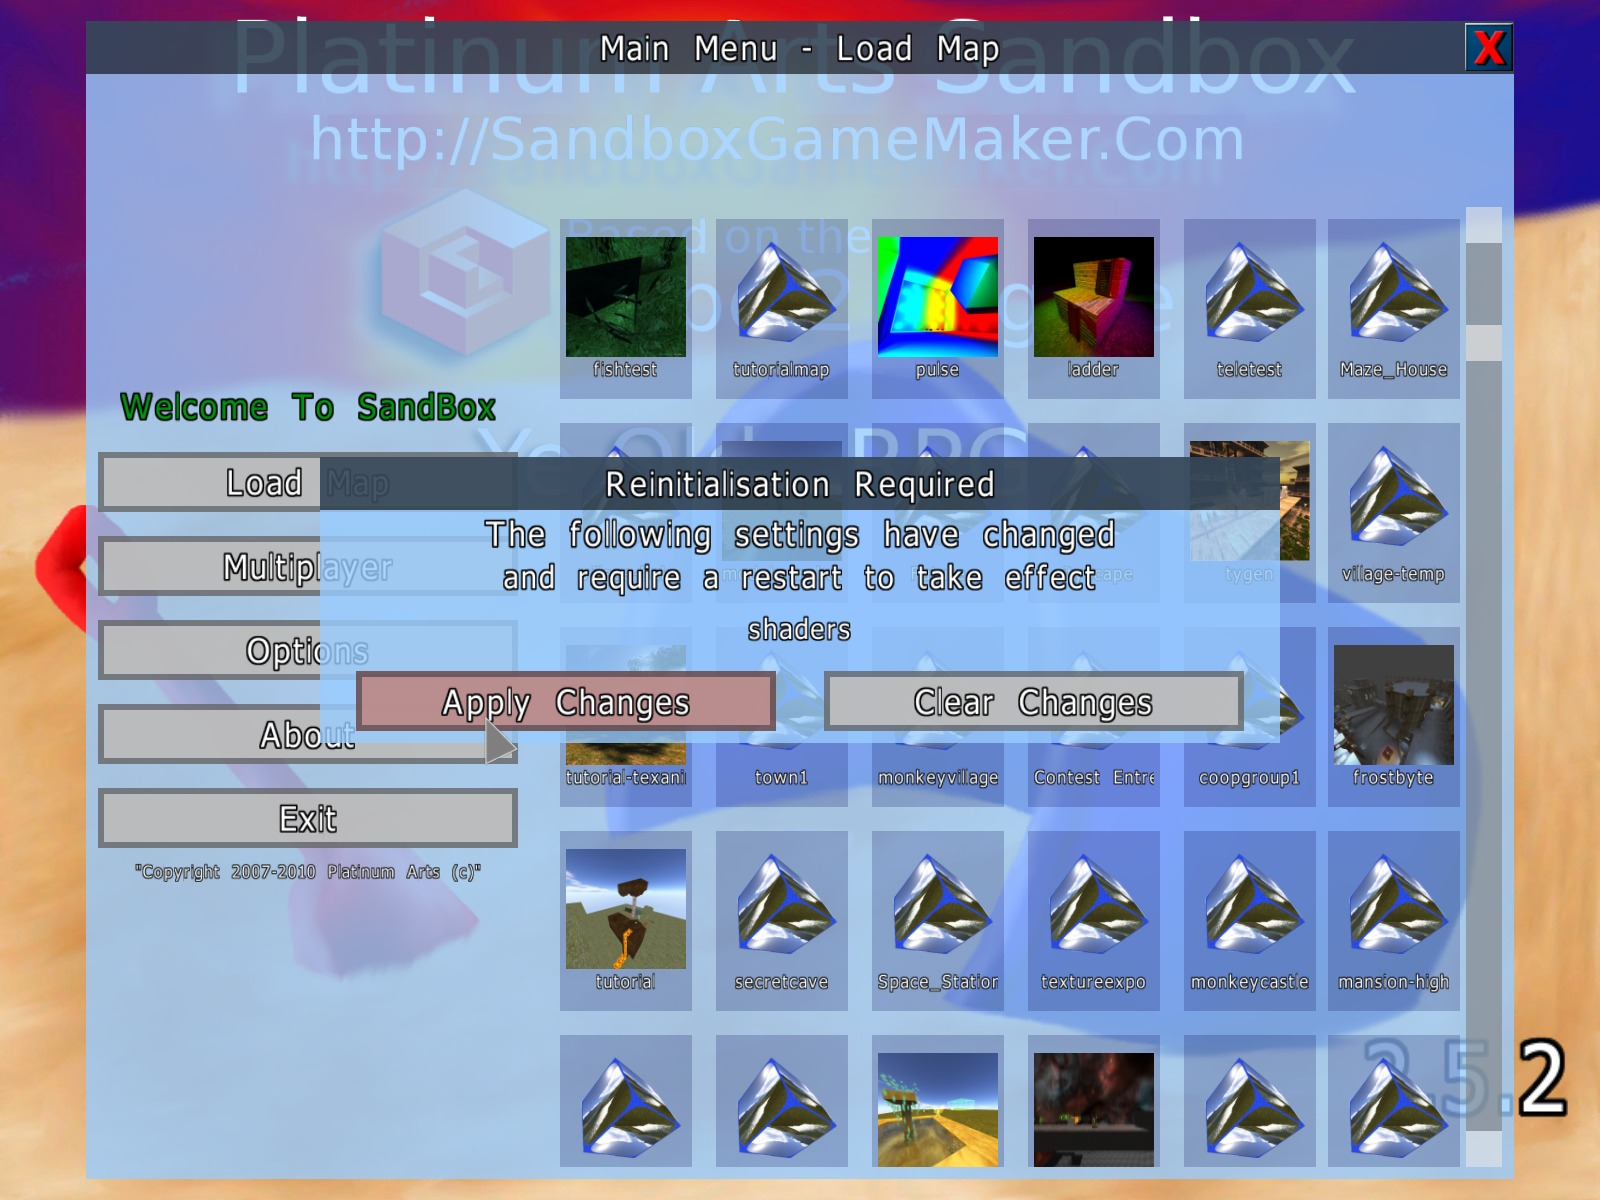 new UI image - Platinum Arts Sandbox Free 3D Game Maker - Mod DB